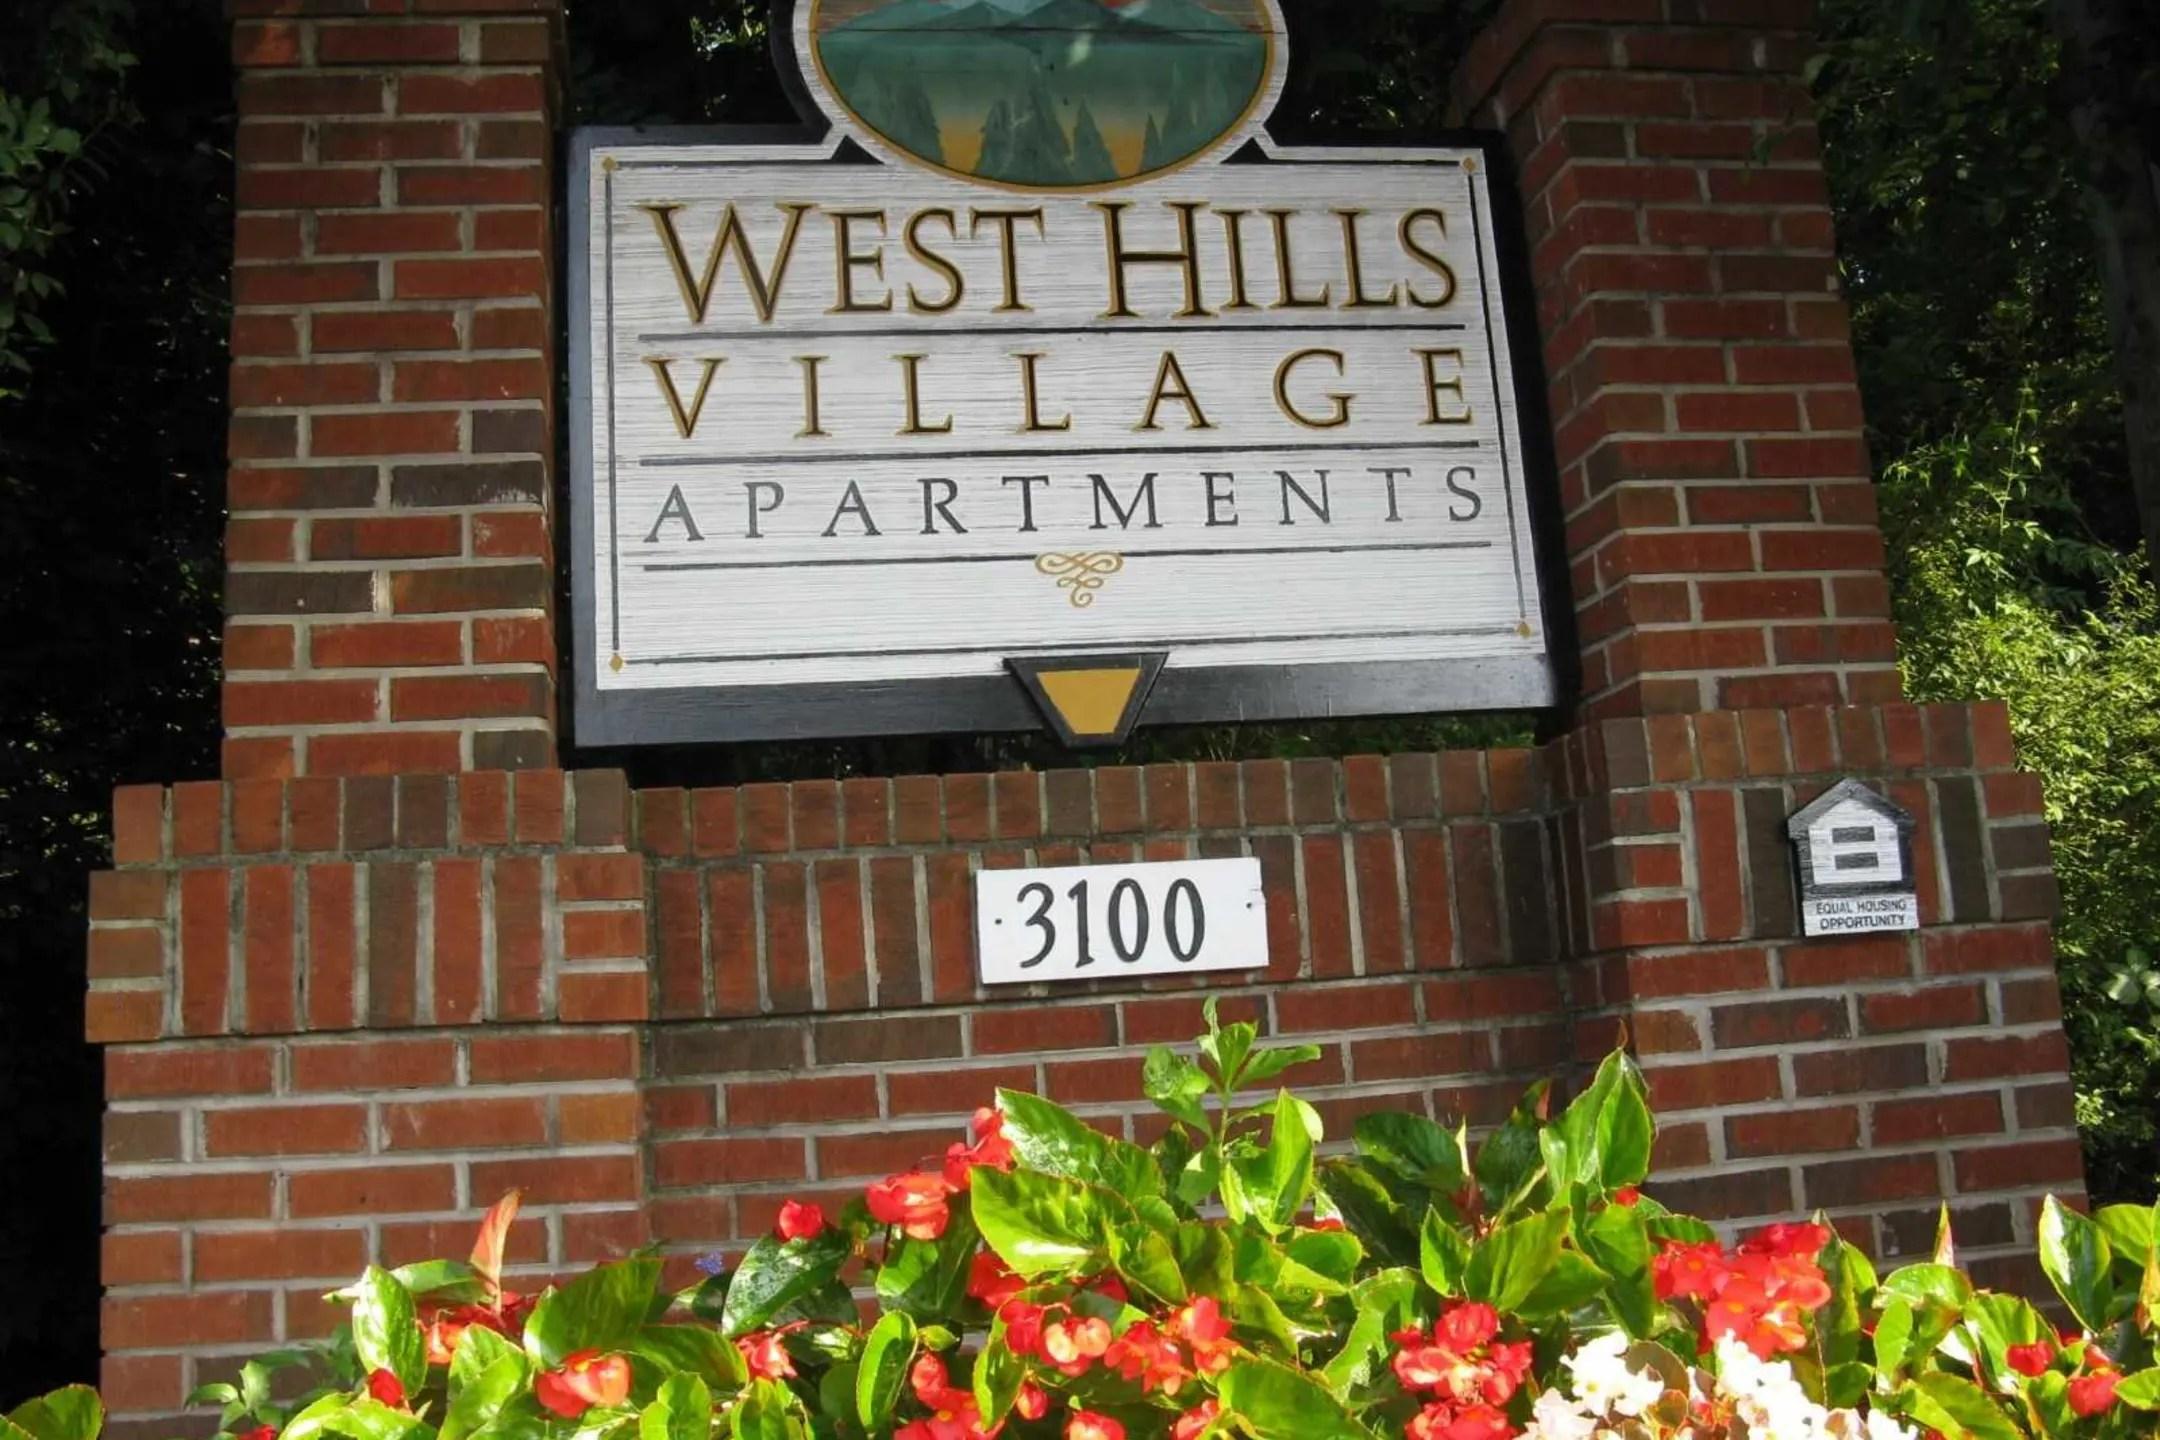 West Hills Village Apartments  Knoxville TN 37909